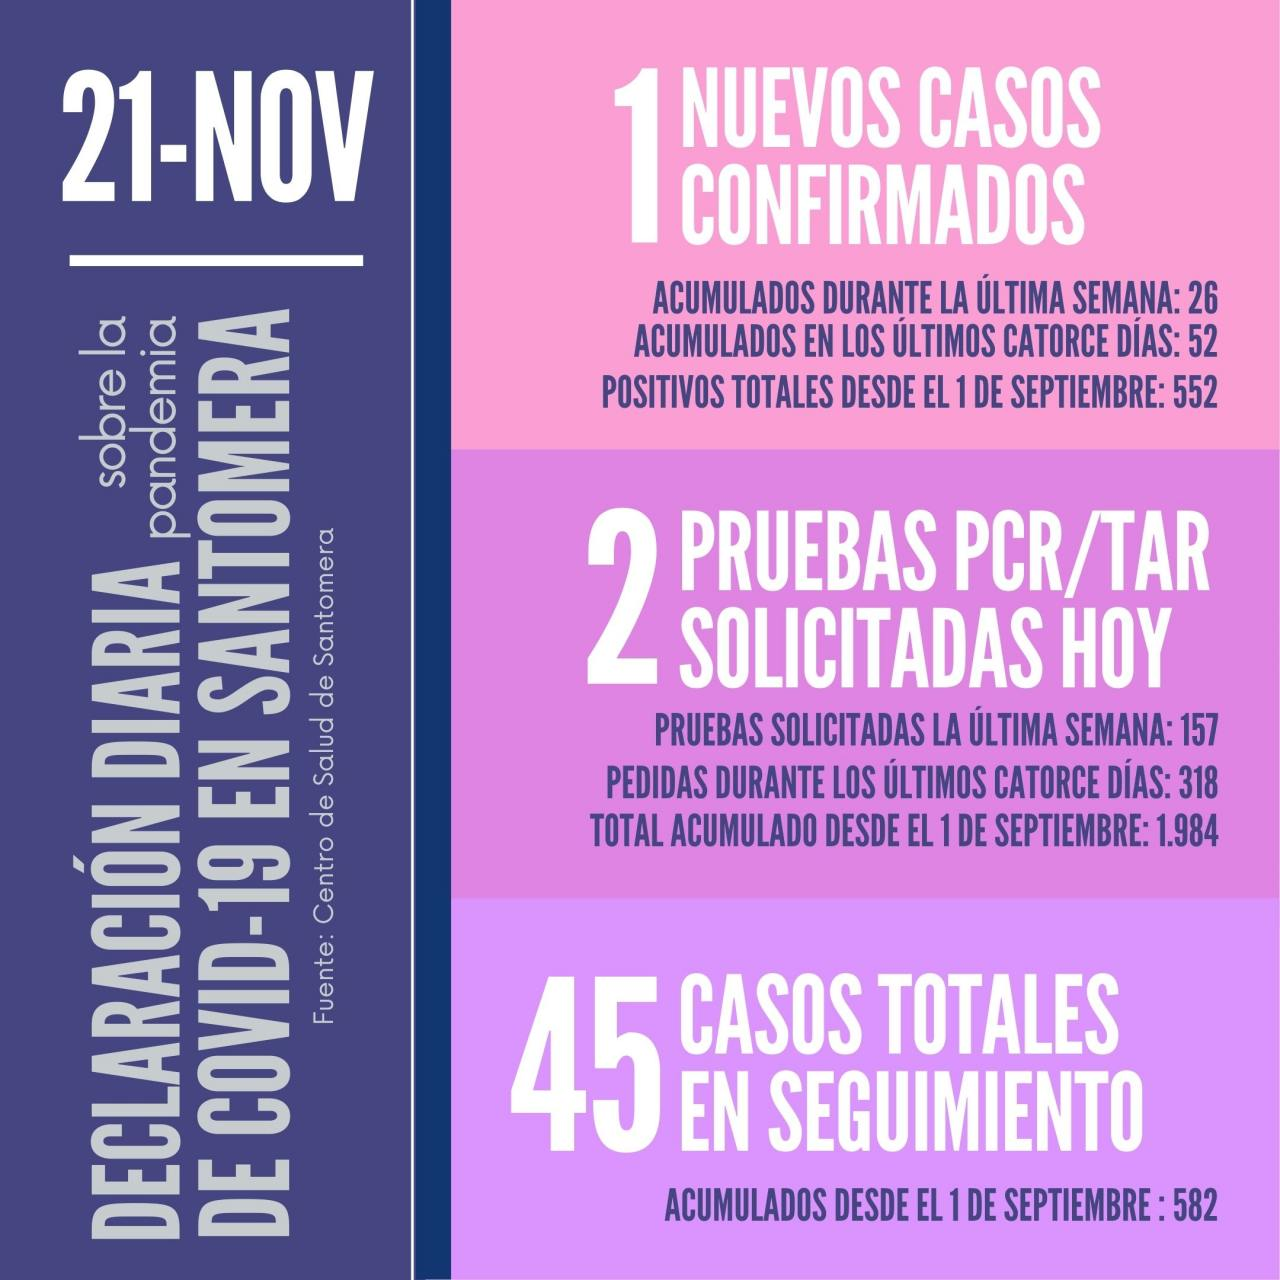 20201121_Datos-COVID-19-Santomera